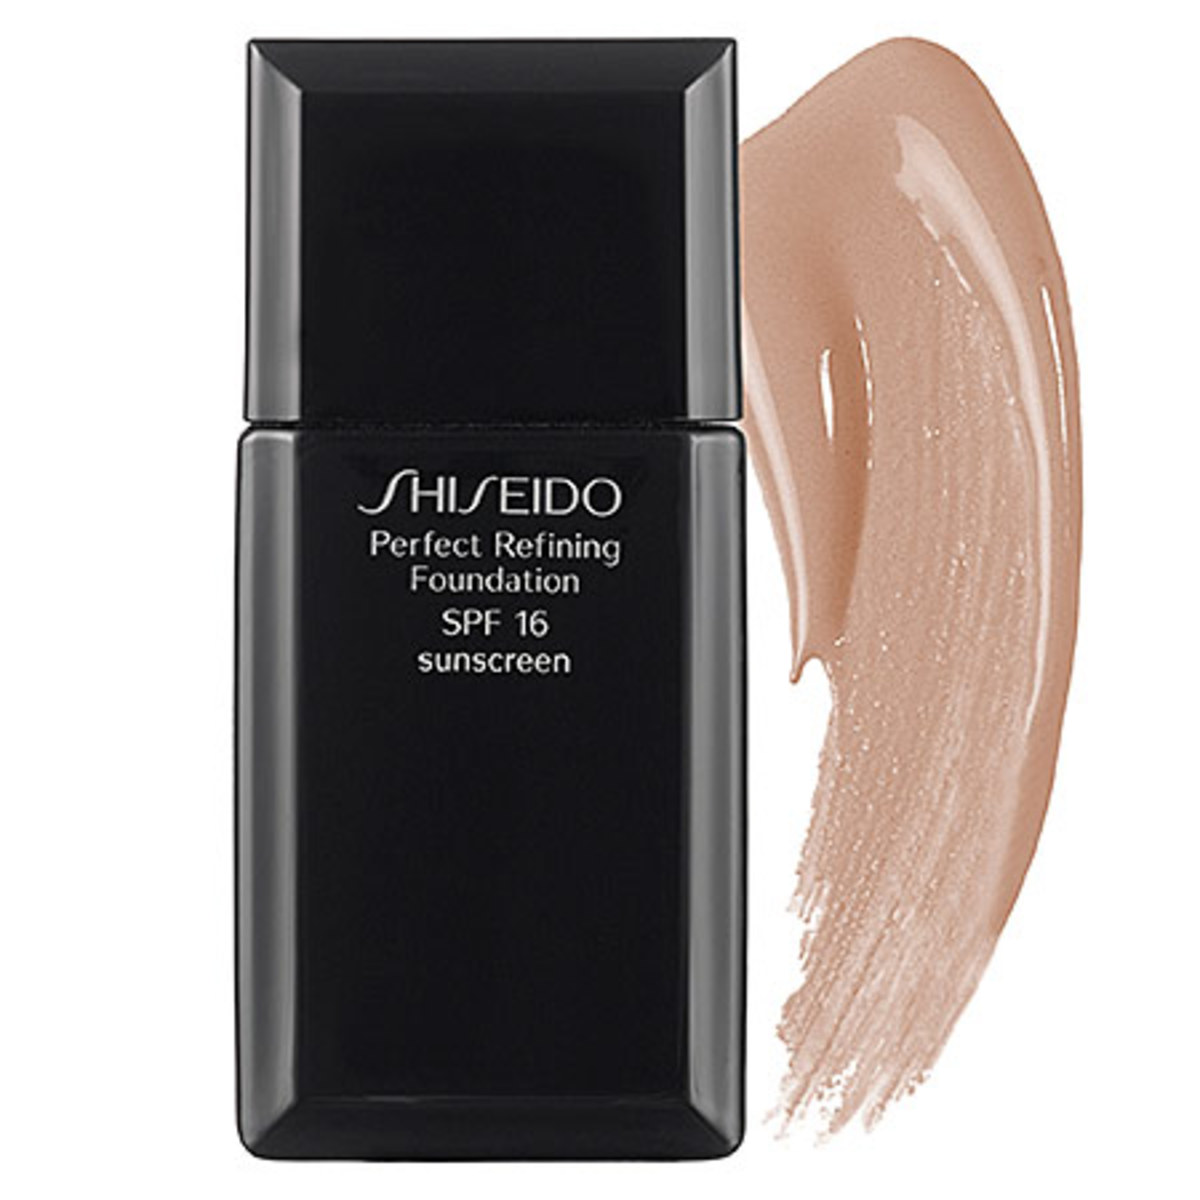 Shiseido Perfect Refining Foundation SPF 16